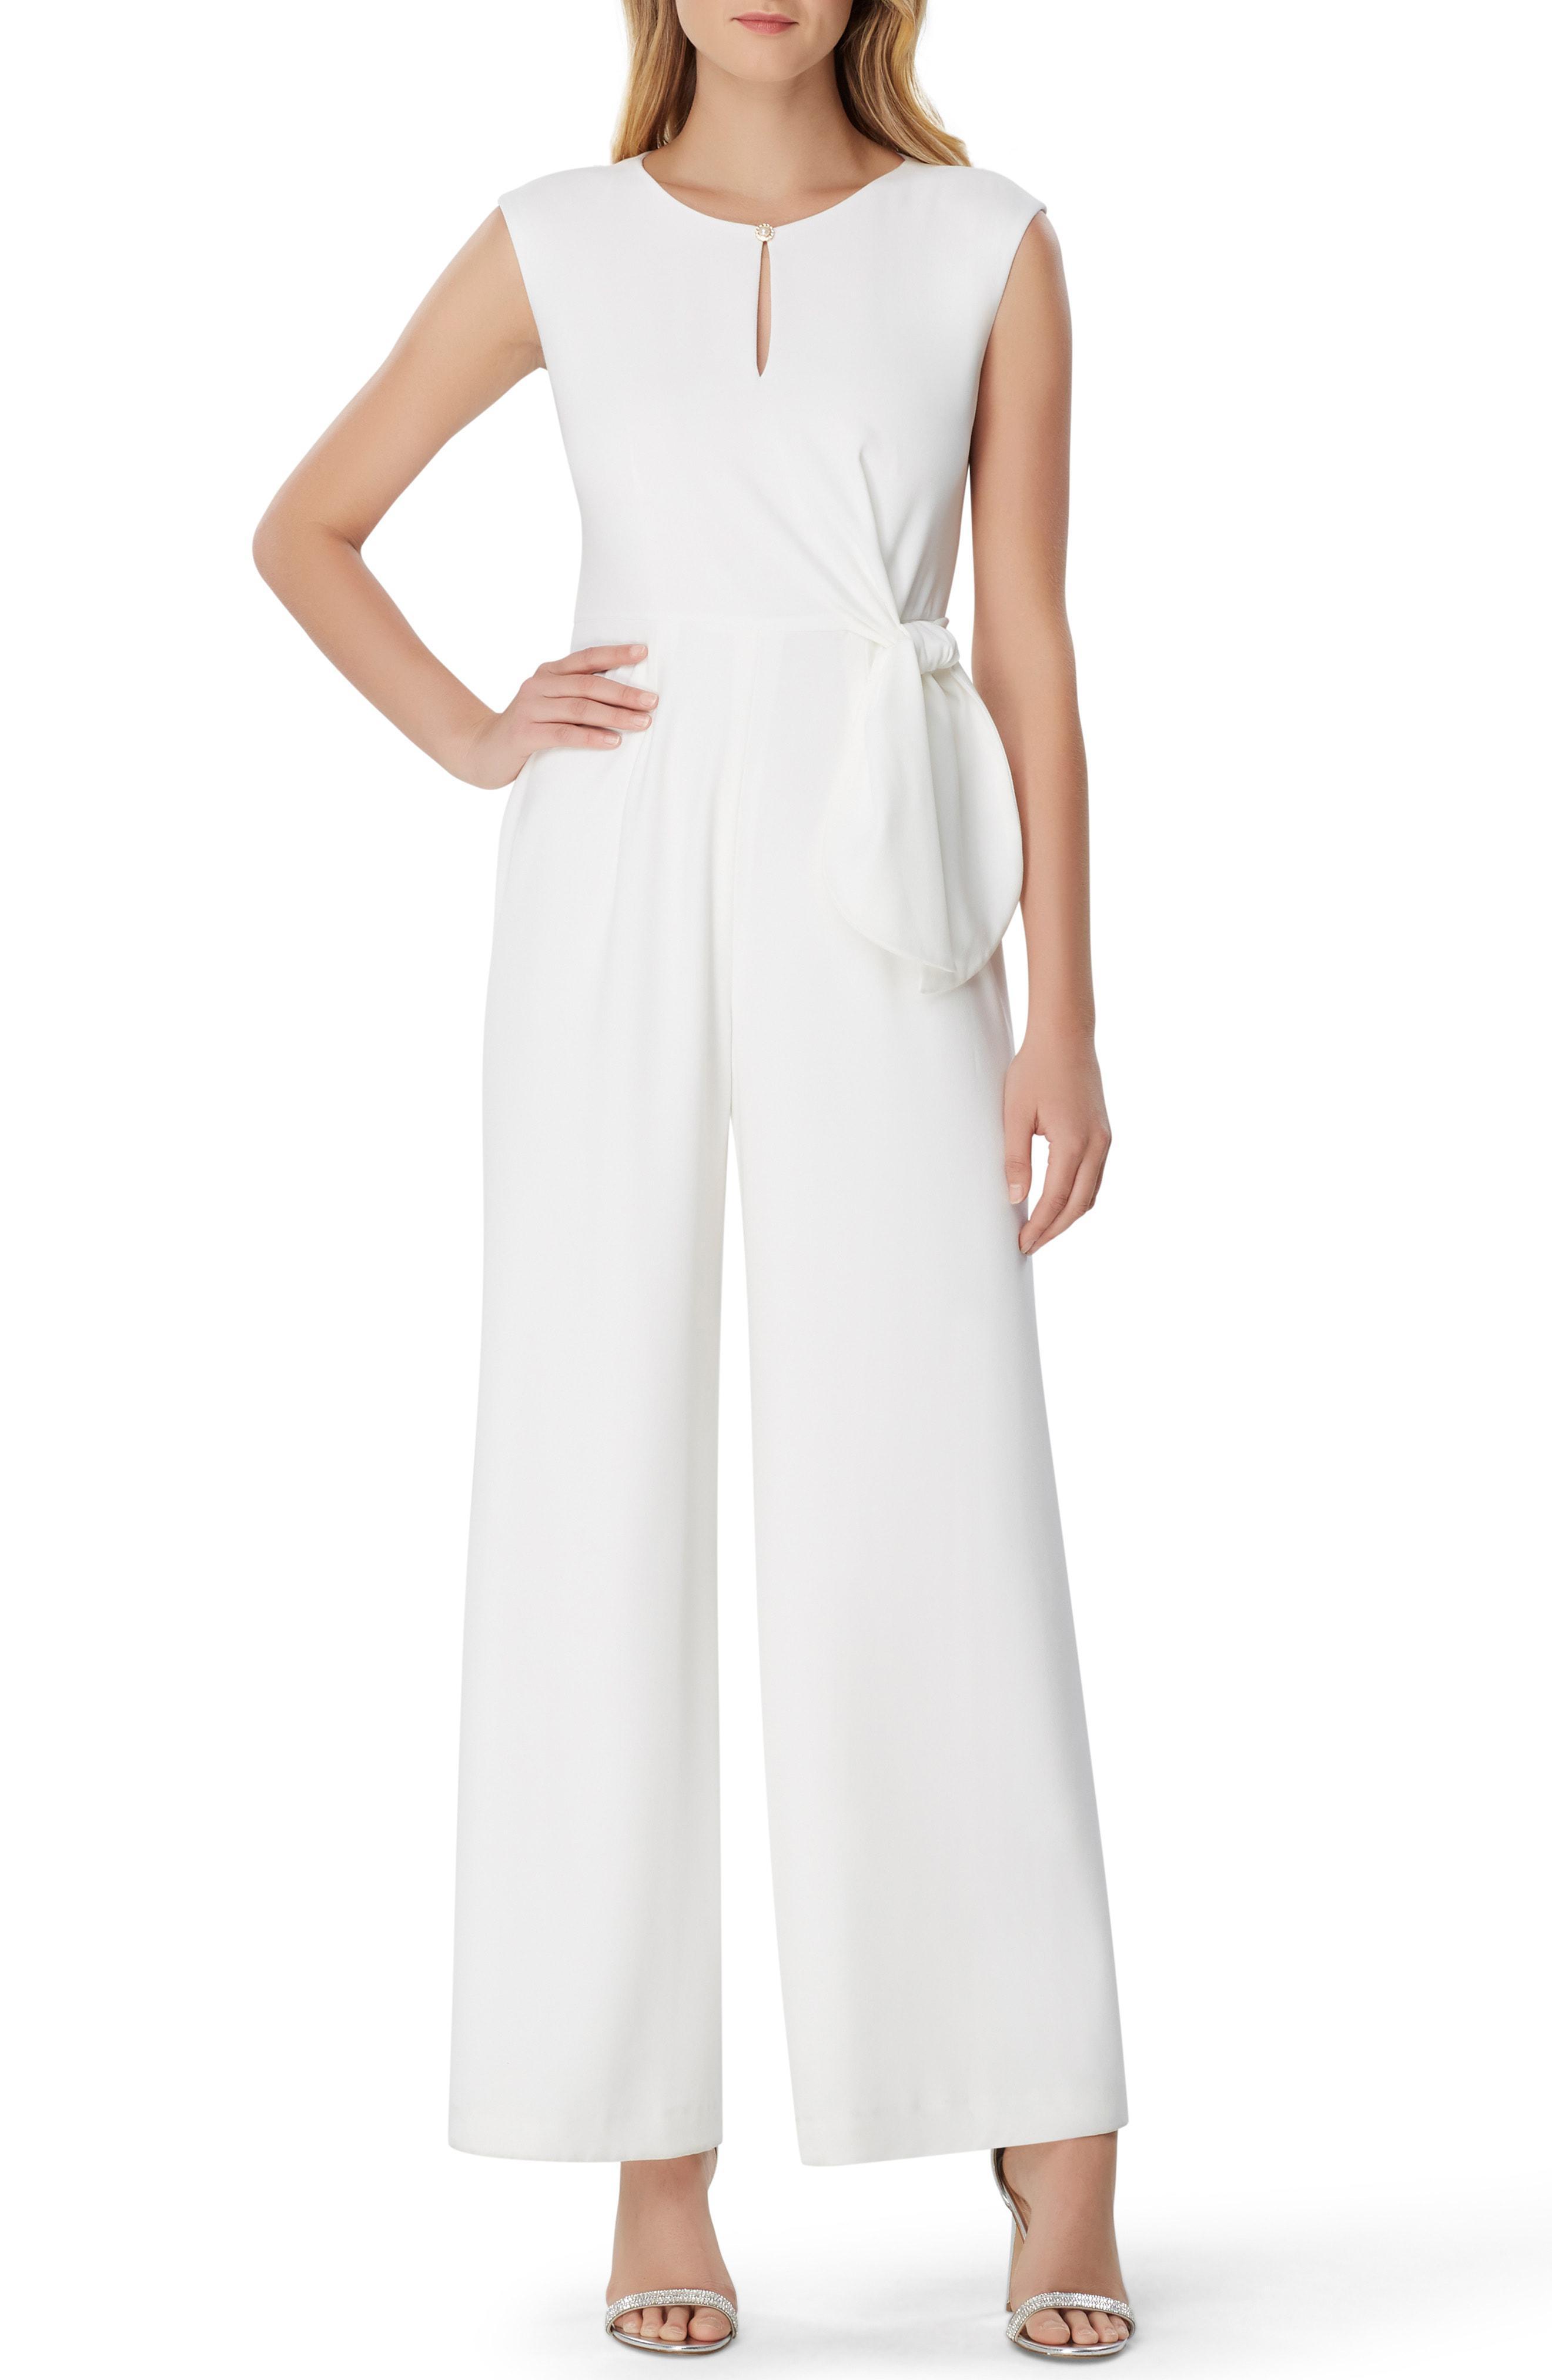 5f946dfad33f No. Tahari - White Crepe Wide Leg Jumpsuit - Lyst. View fullscreen